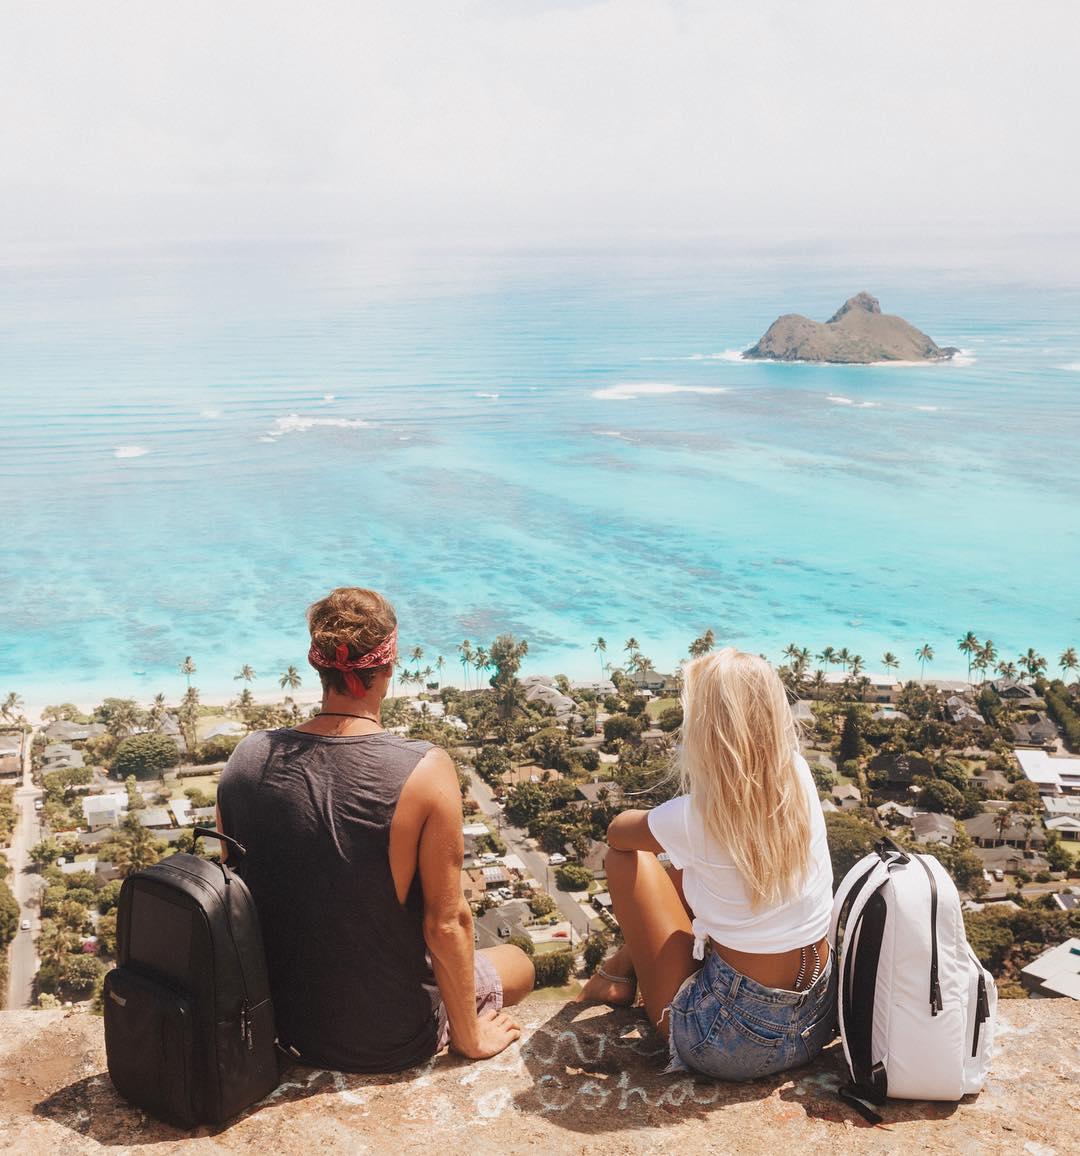 Lanikai Pillbox Viewpoint - #15 on the 15 Best Hikes on Oahu